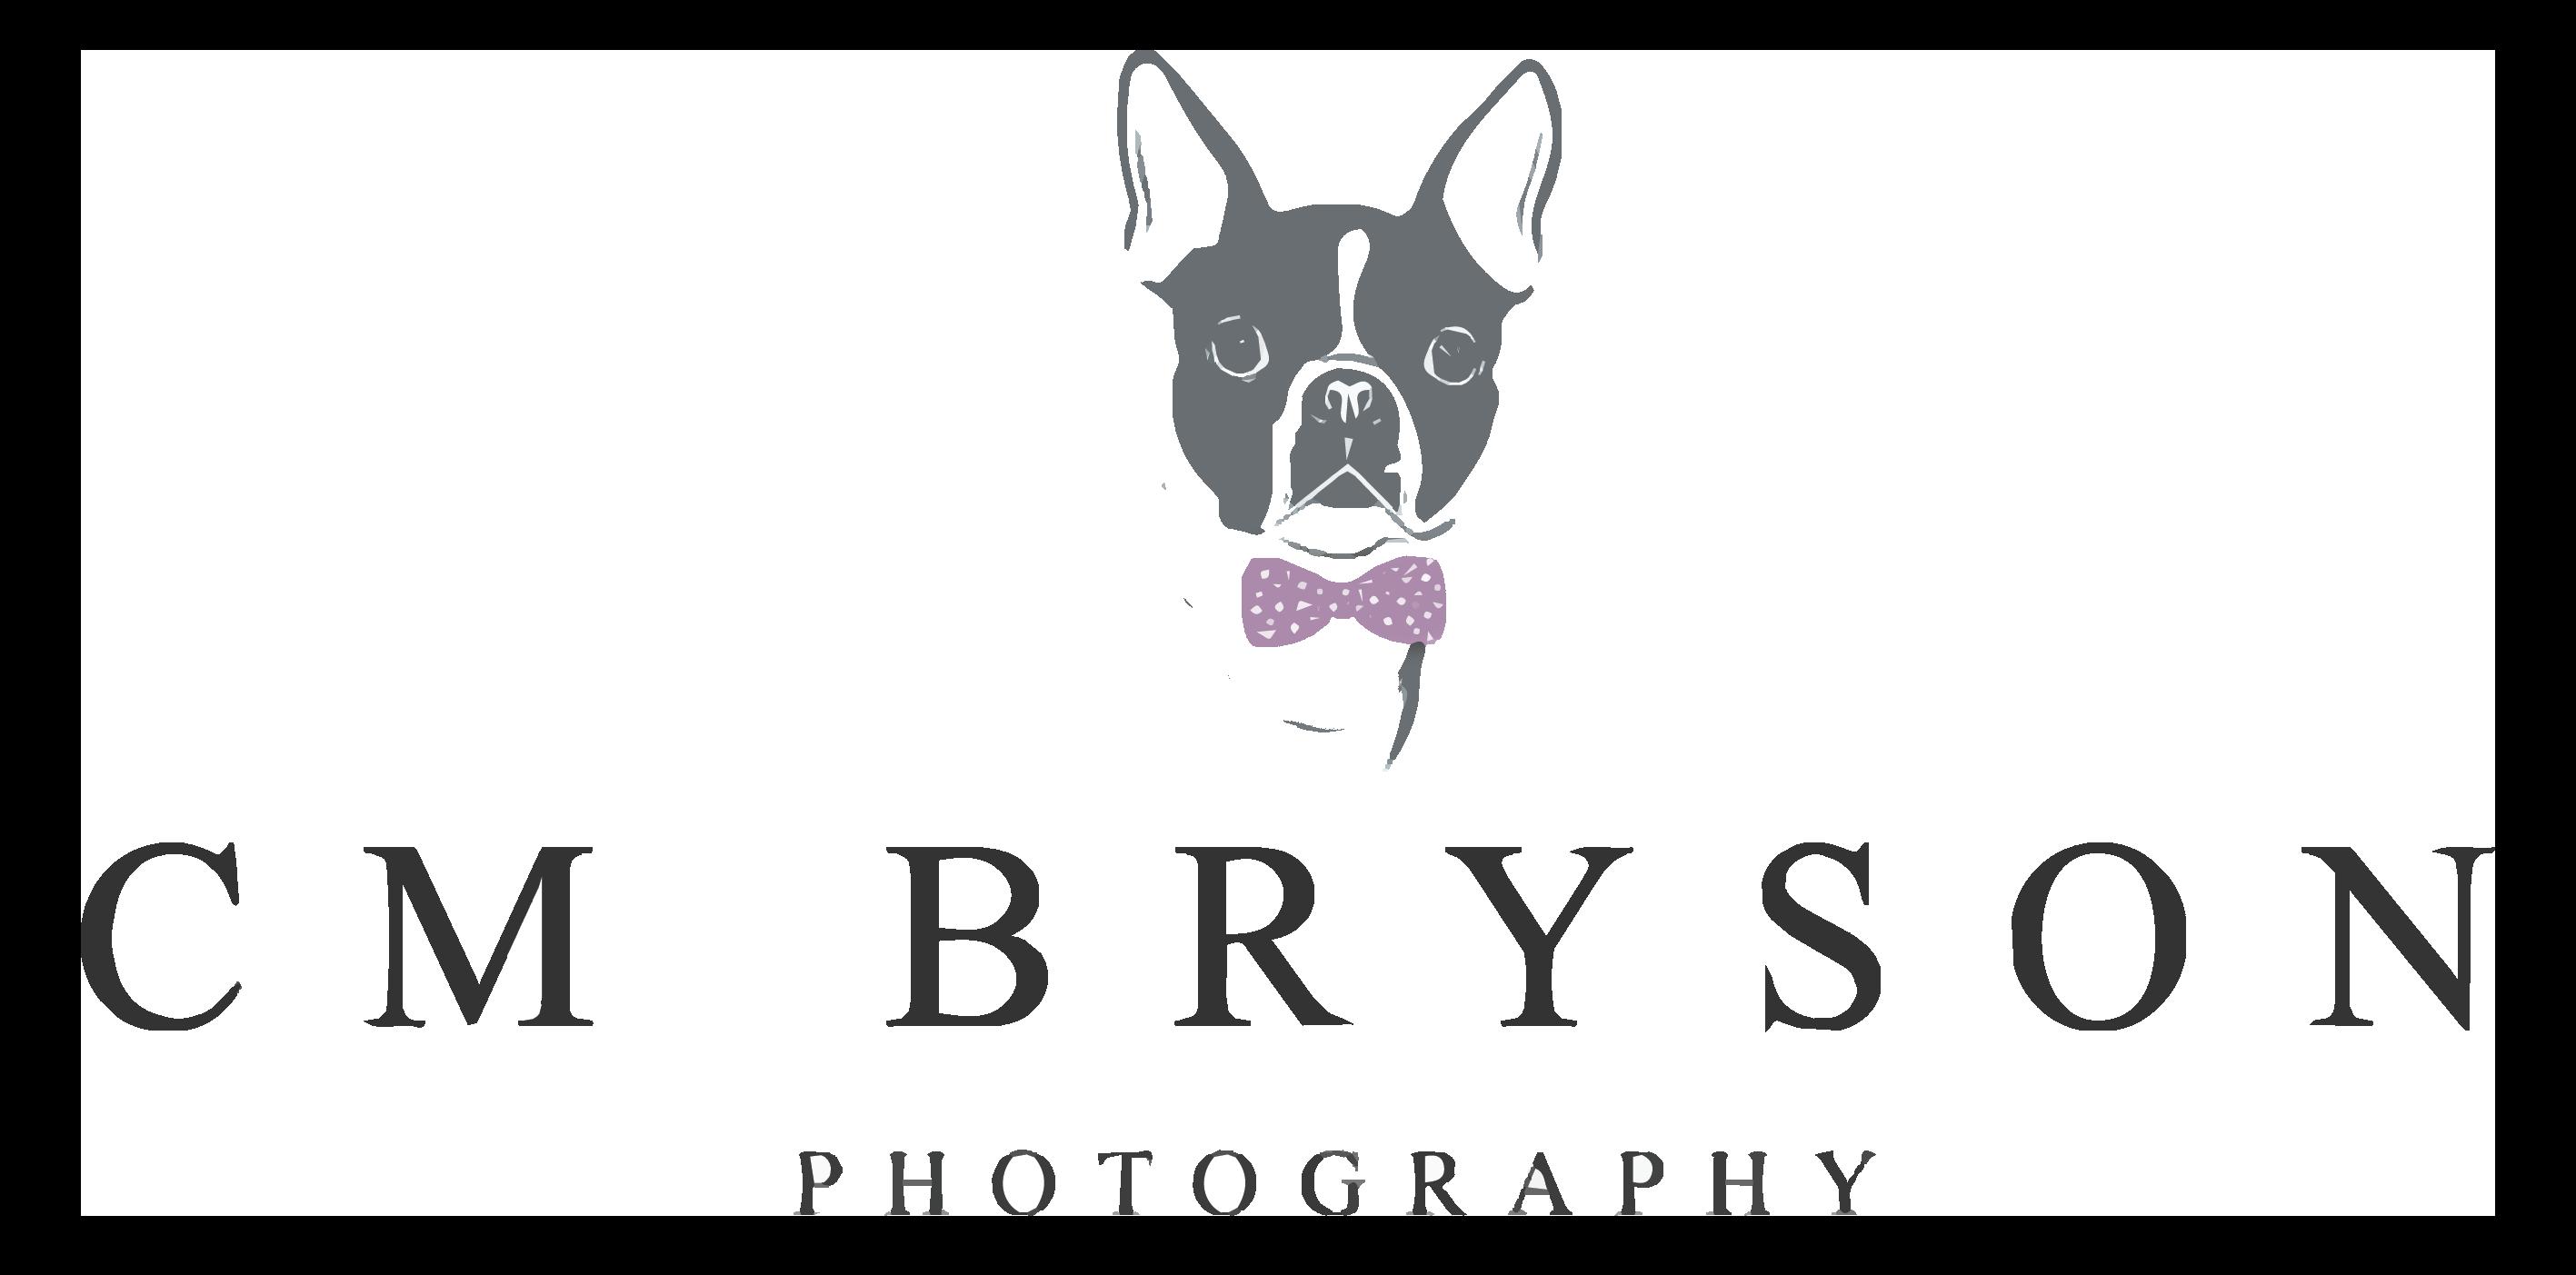 CM Bryson